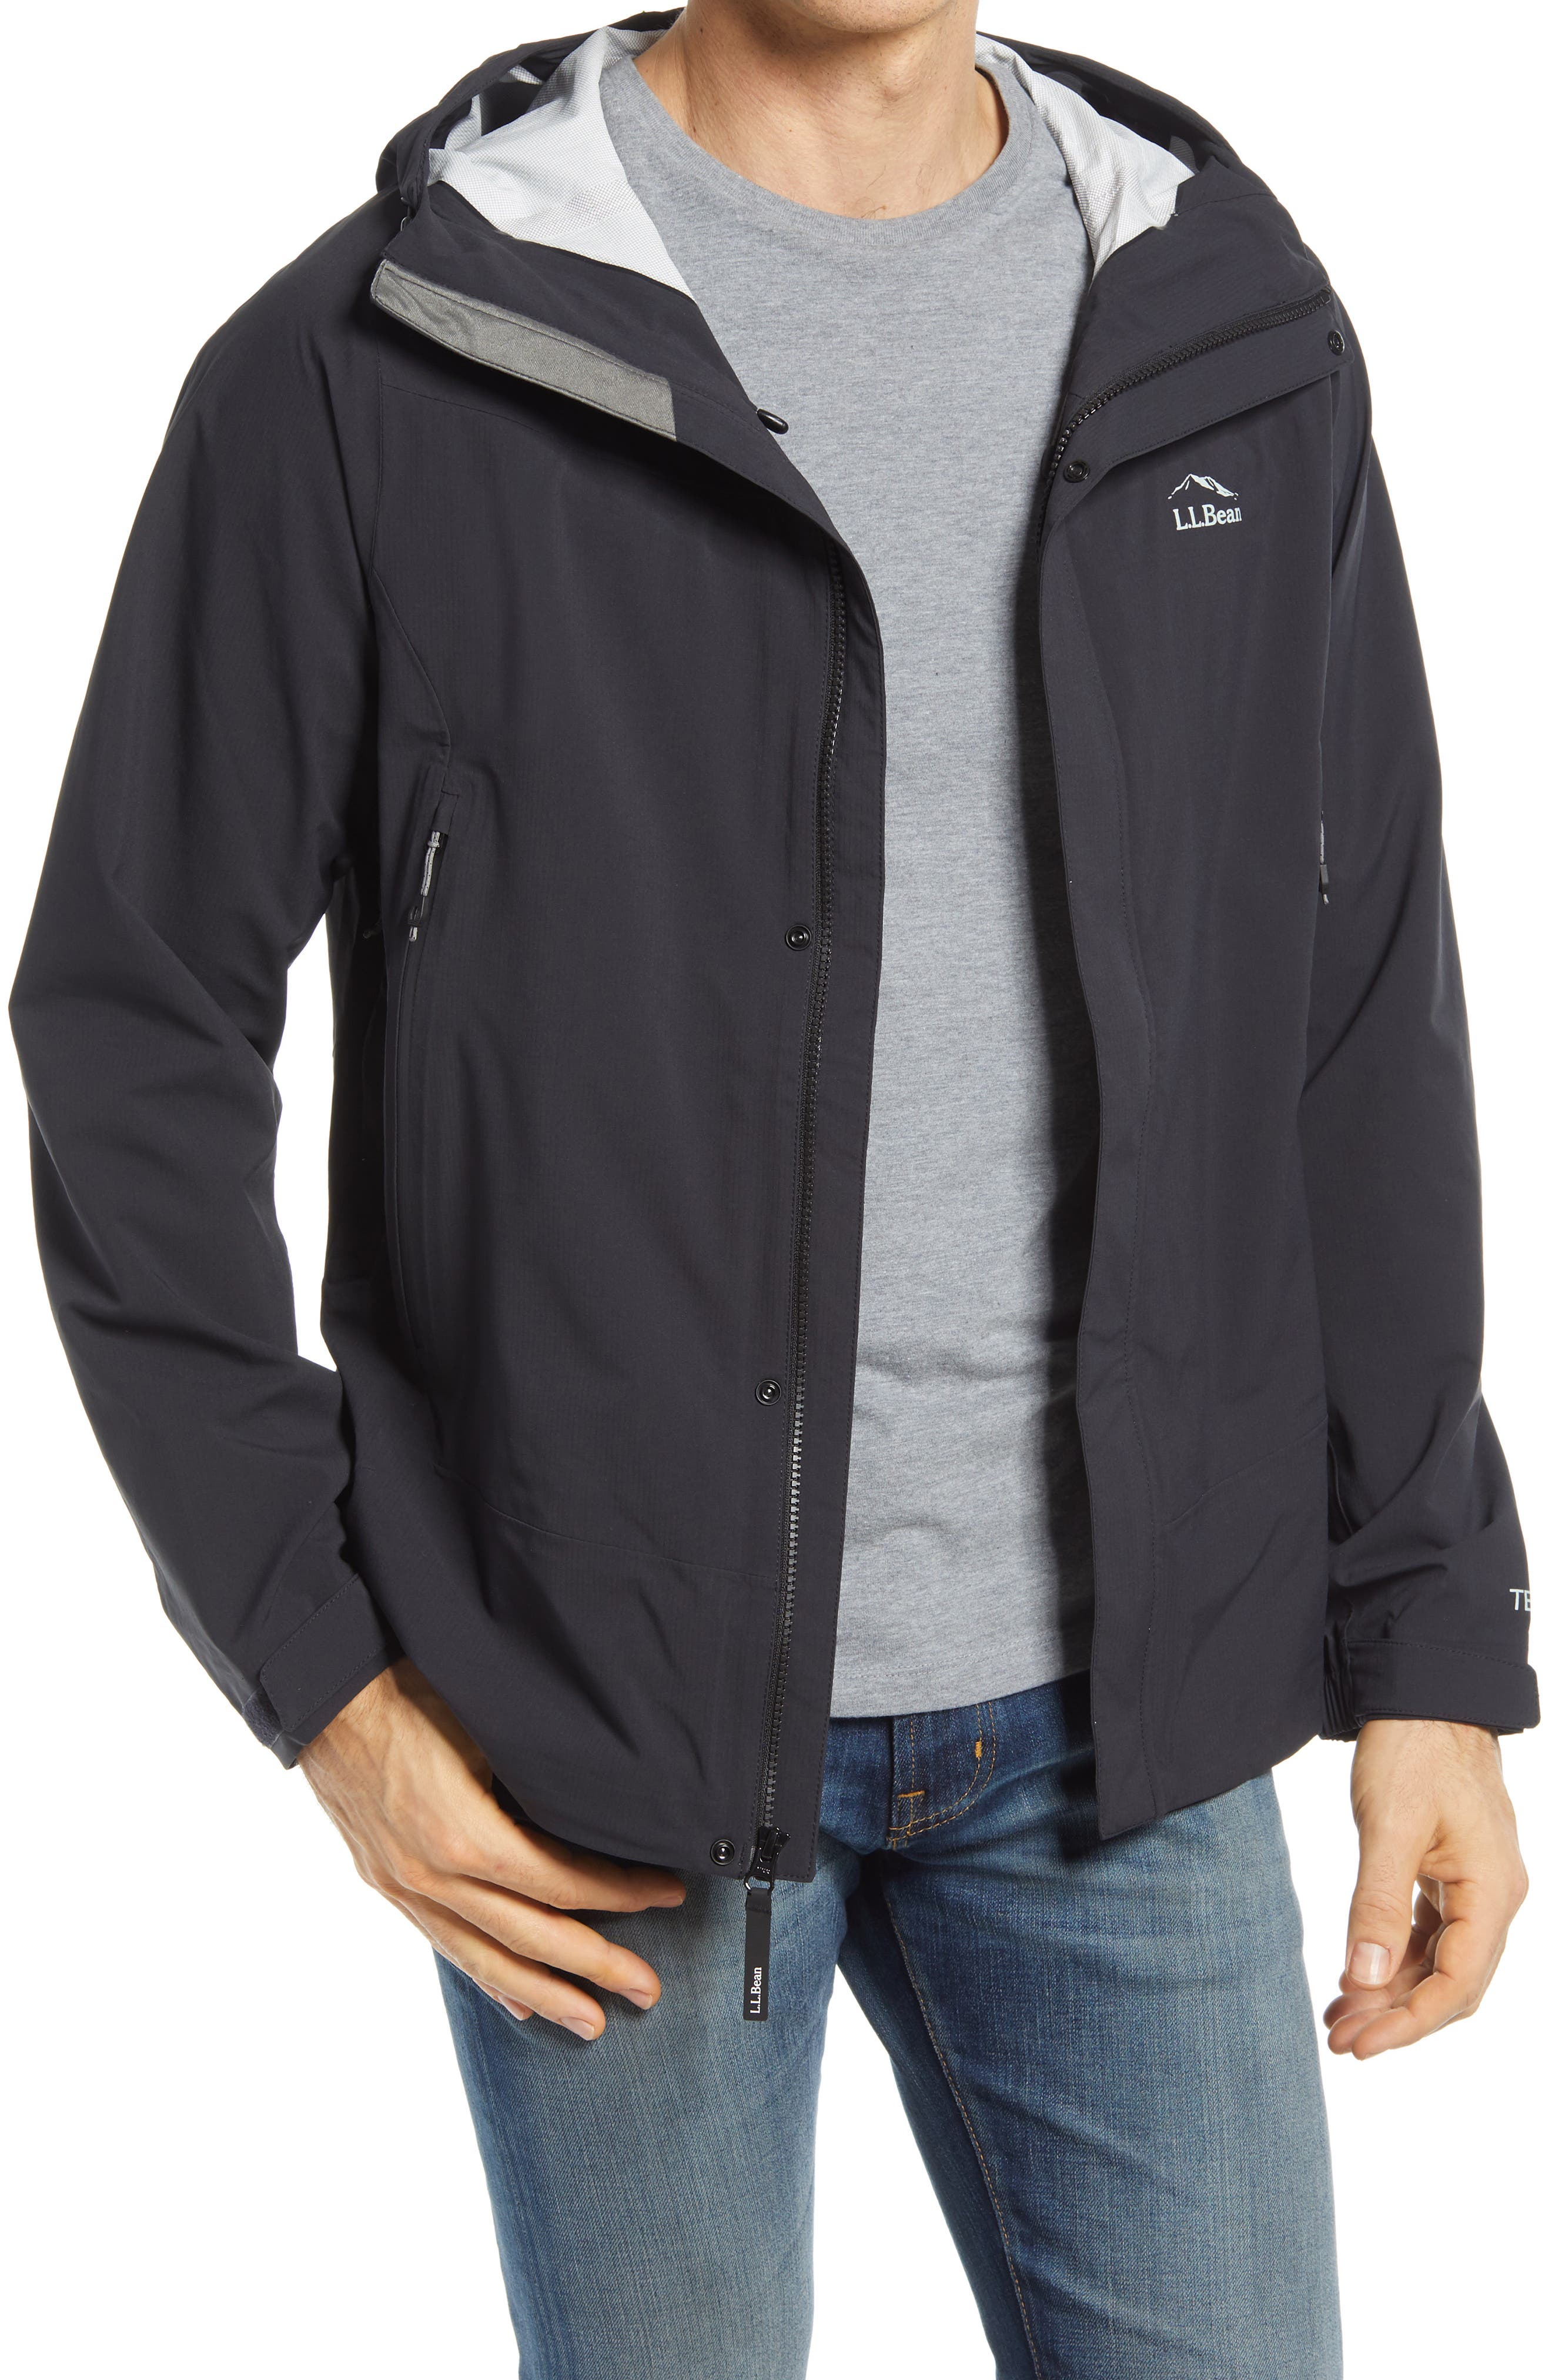 Men's L.l. Bean Cresta Stretch Raincoat